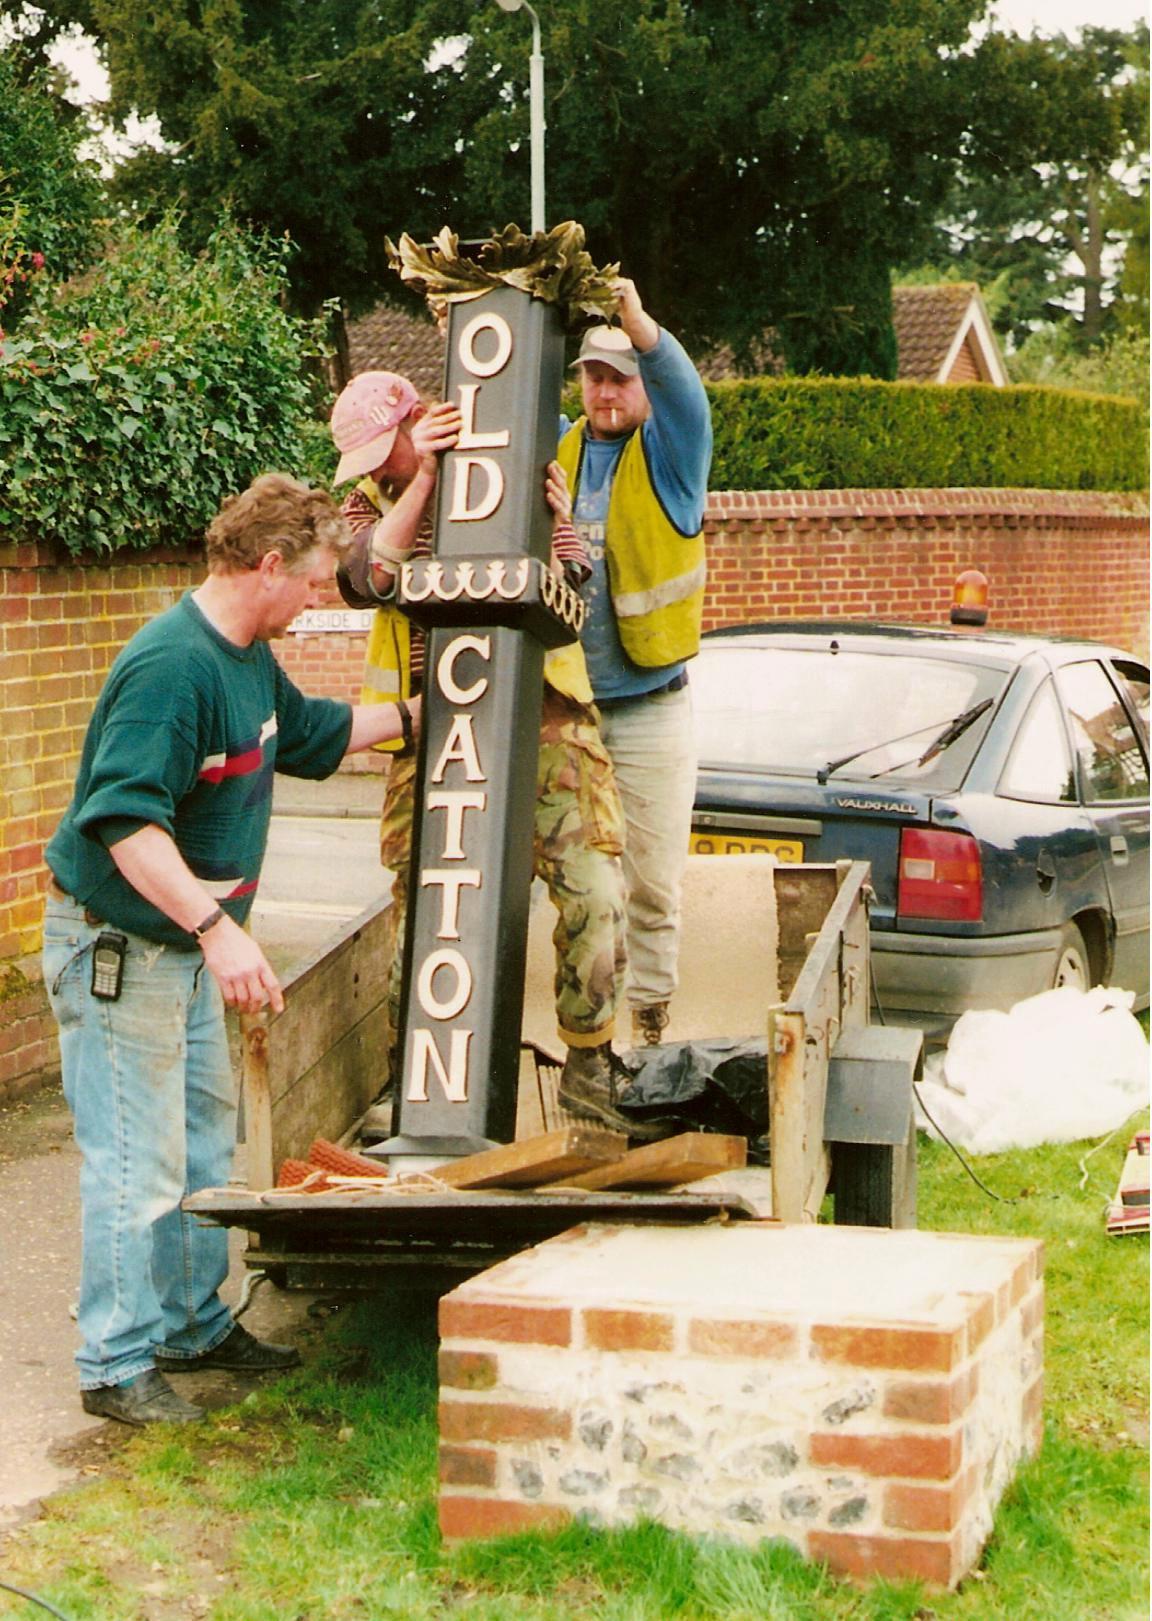 The new column arrives - 2001